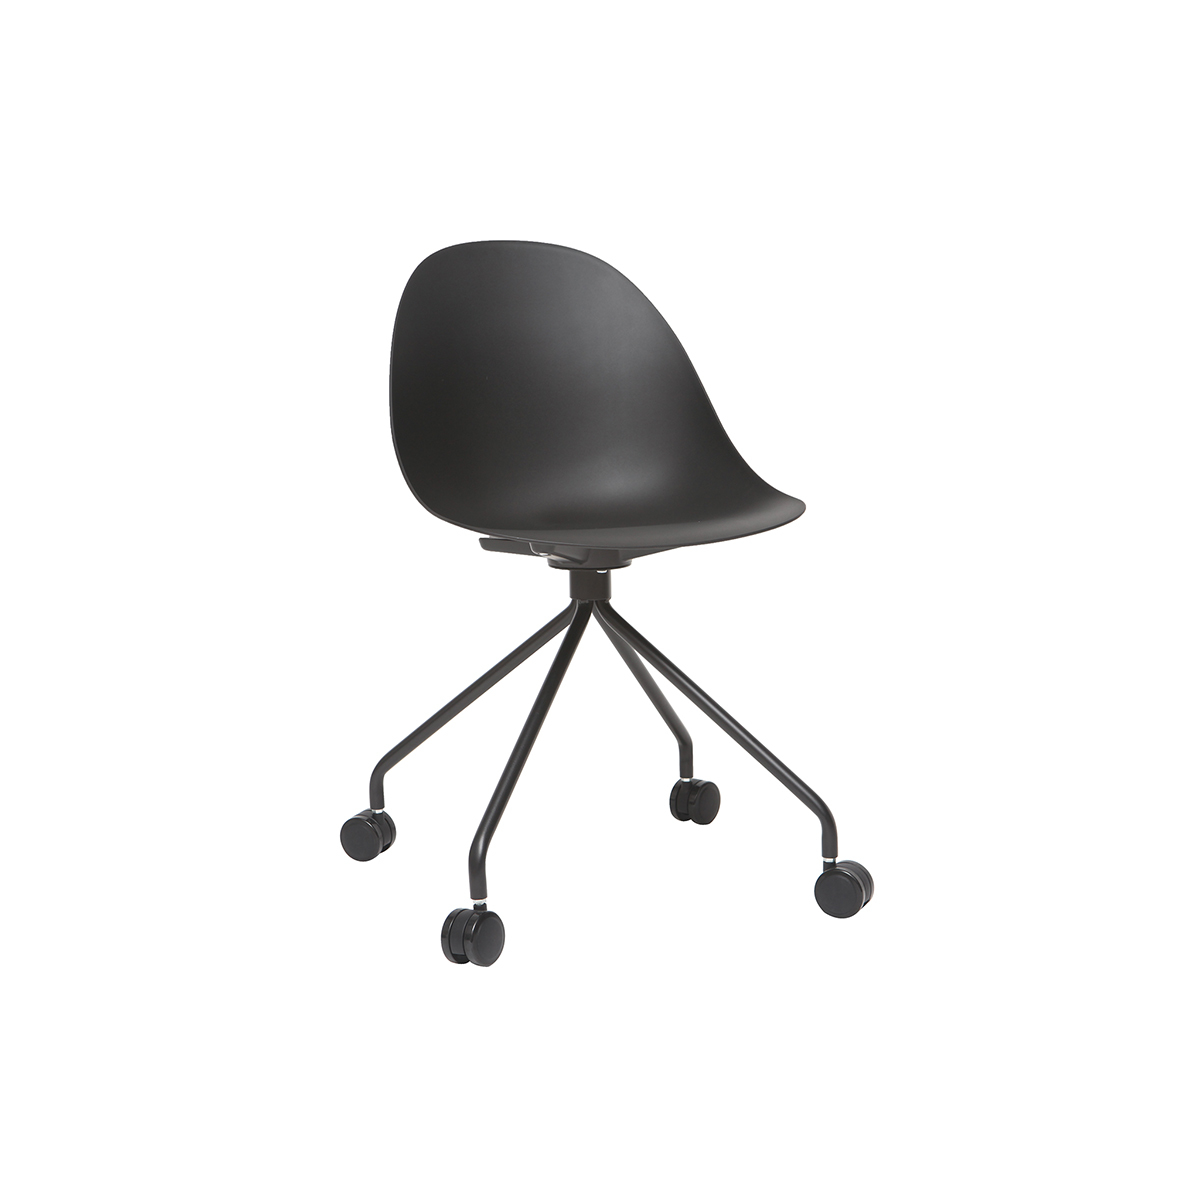 1e17891f0ea0e fauteuil-de-bureau-design-noir-concha-45543-principale_1200_1200_0.jpg